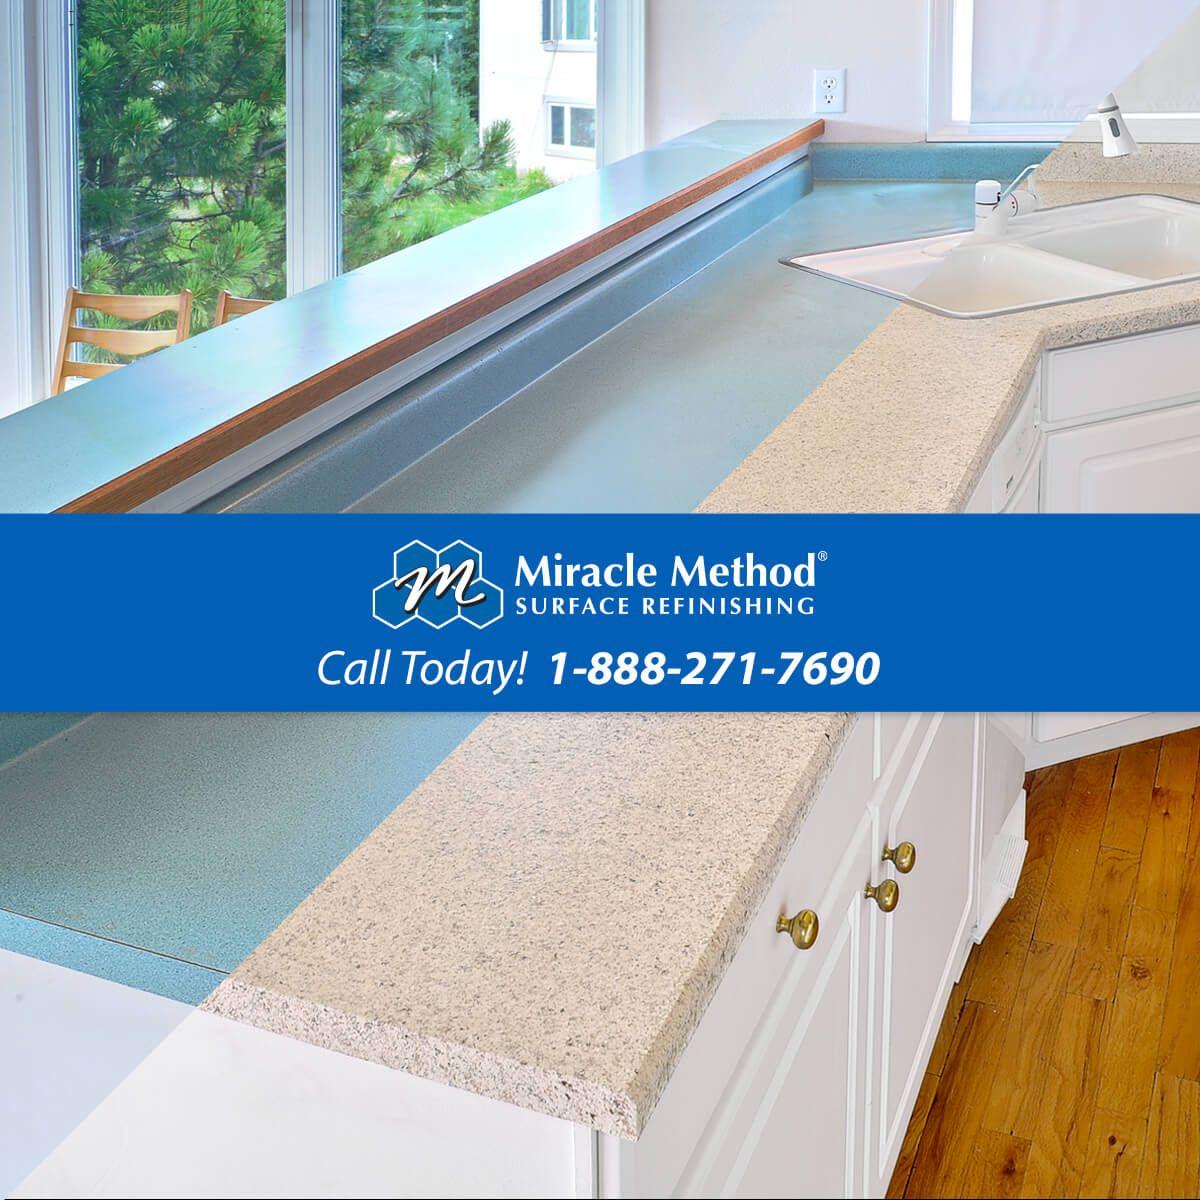 Fiberglass Bathtub Refinishing – Porcelain Tub Refinishing ...